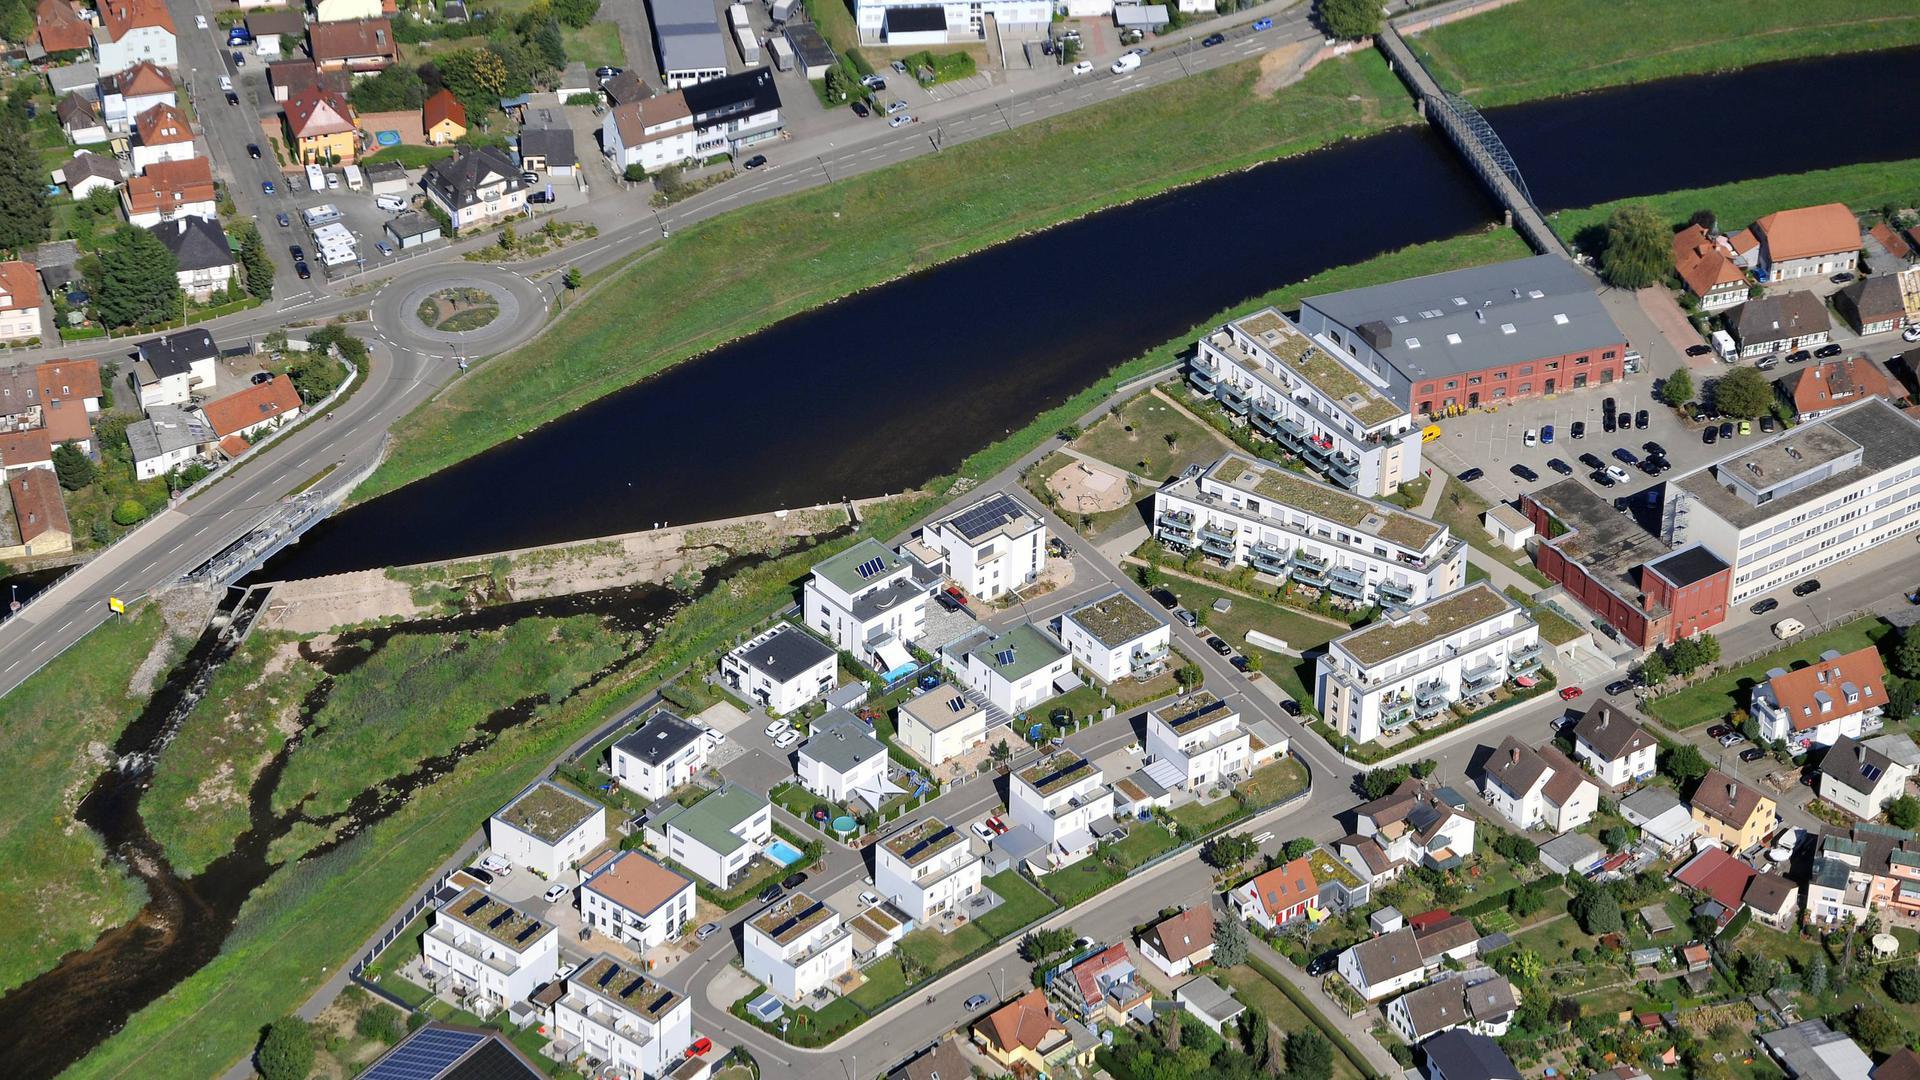 Luftbilder Hammerschmiede Gaggenau Werke Luxusmarke Gaggenau